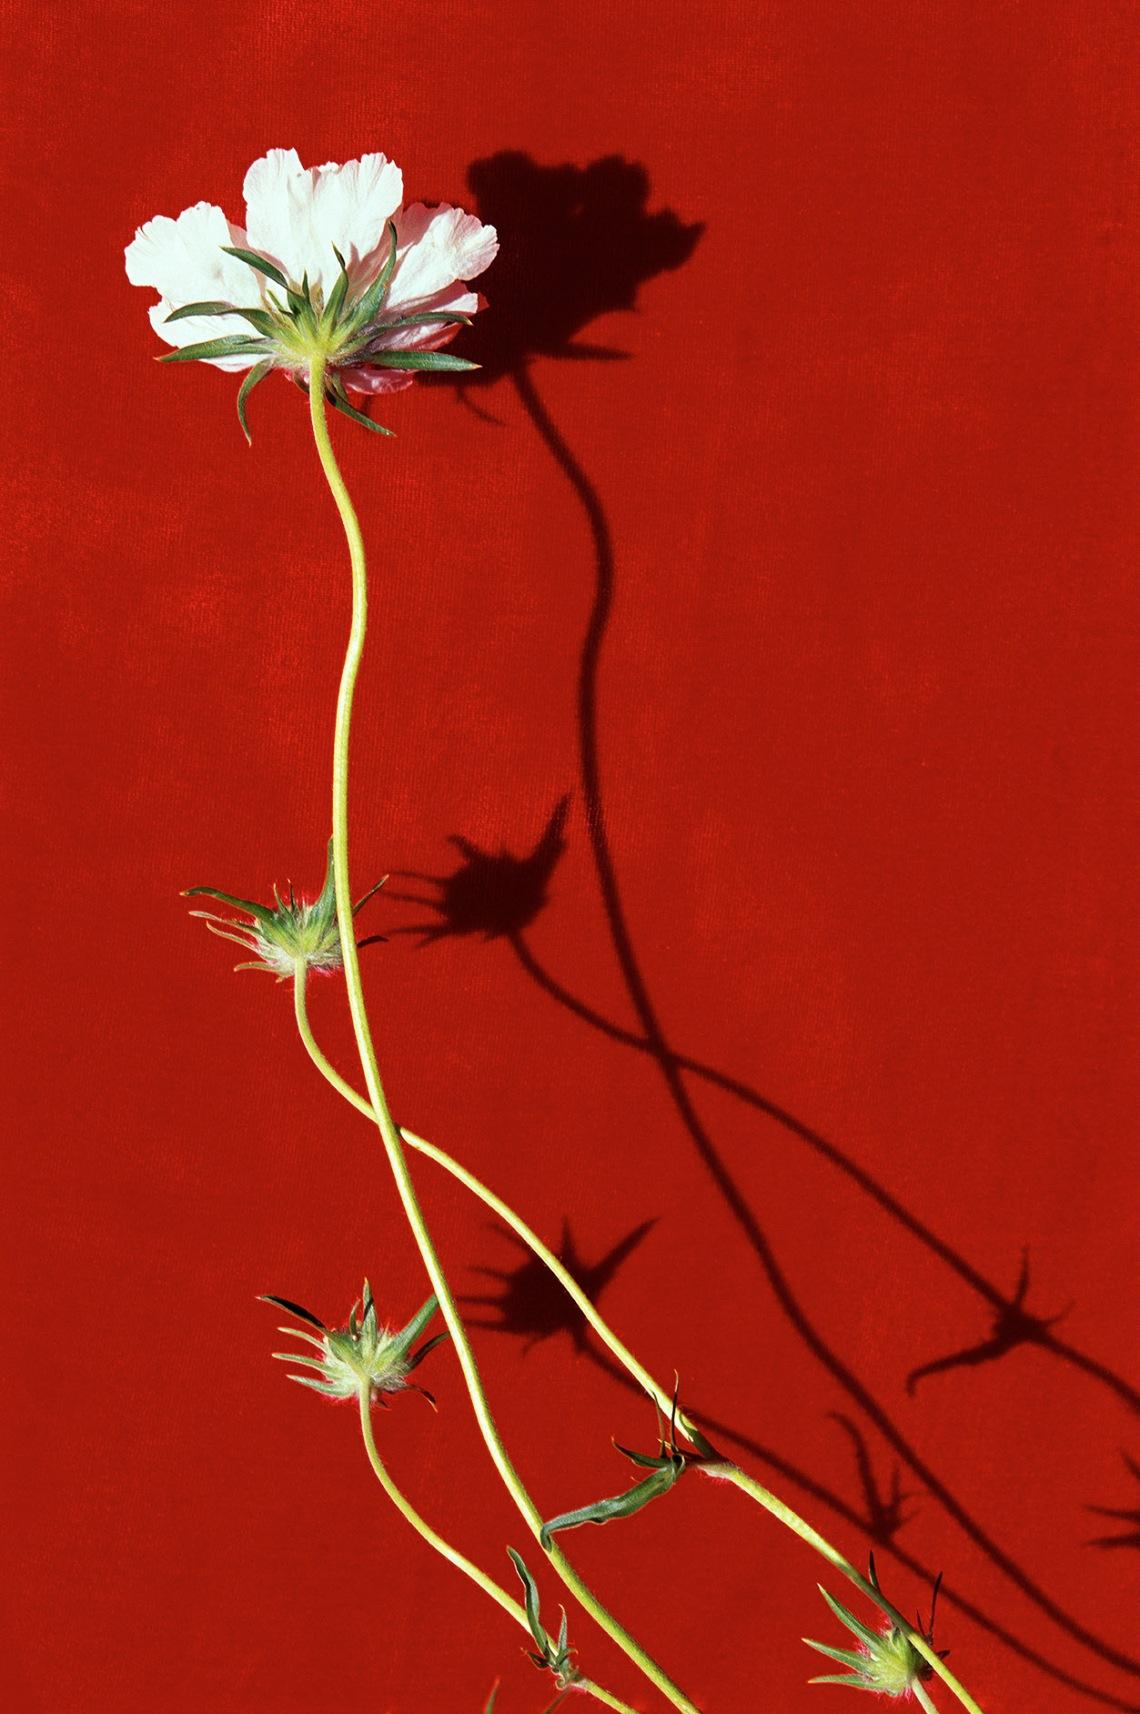 White Armeria Flower on Red